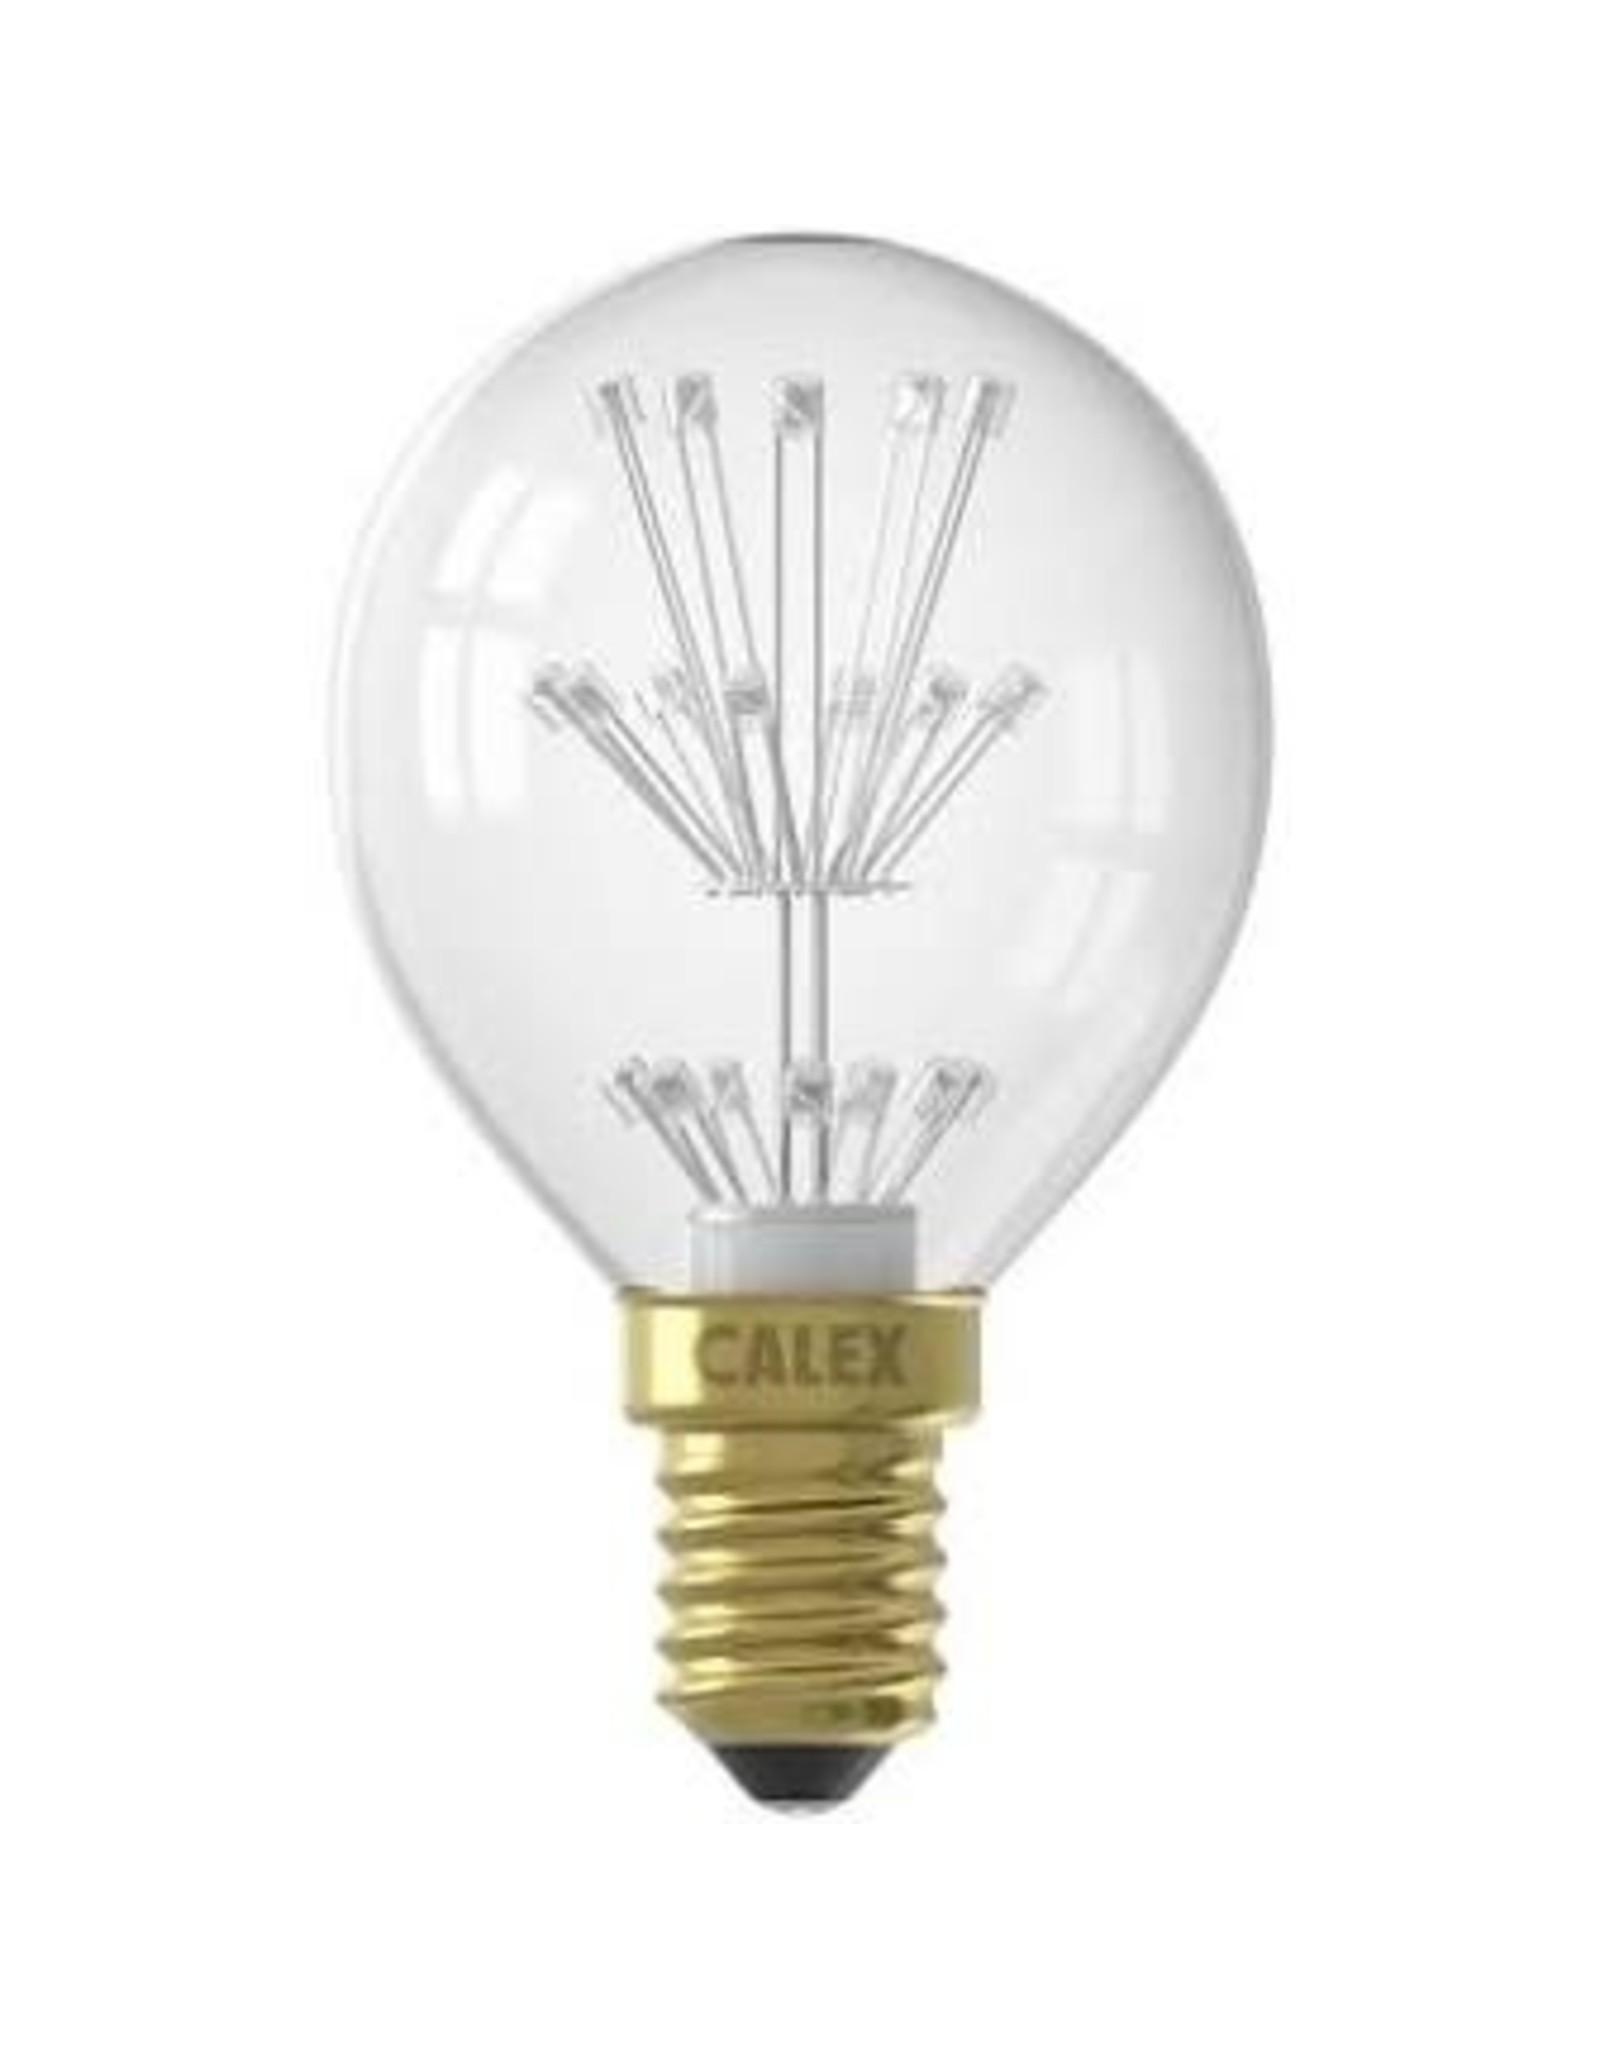 Calex Pearl LED Ball lamp 220-240V 1,0W E14 P45, 20-leds 2100K, energy label A++